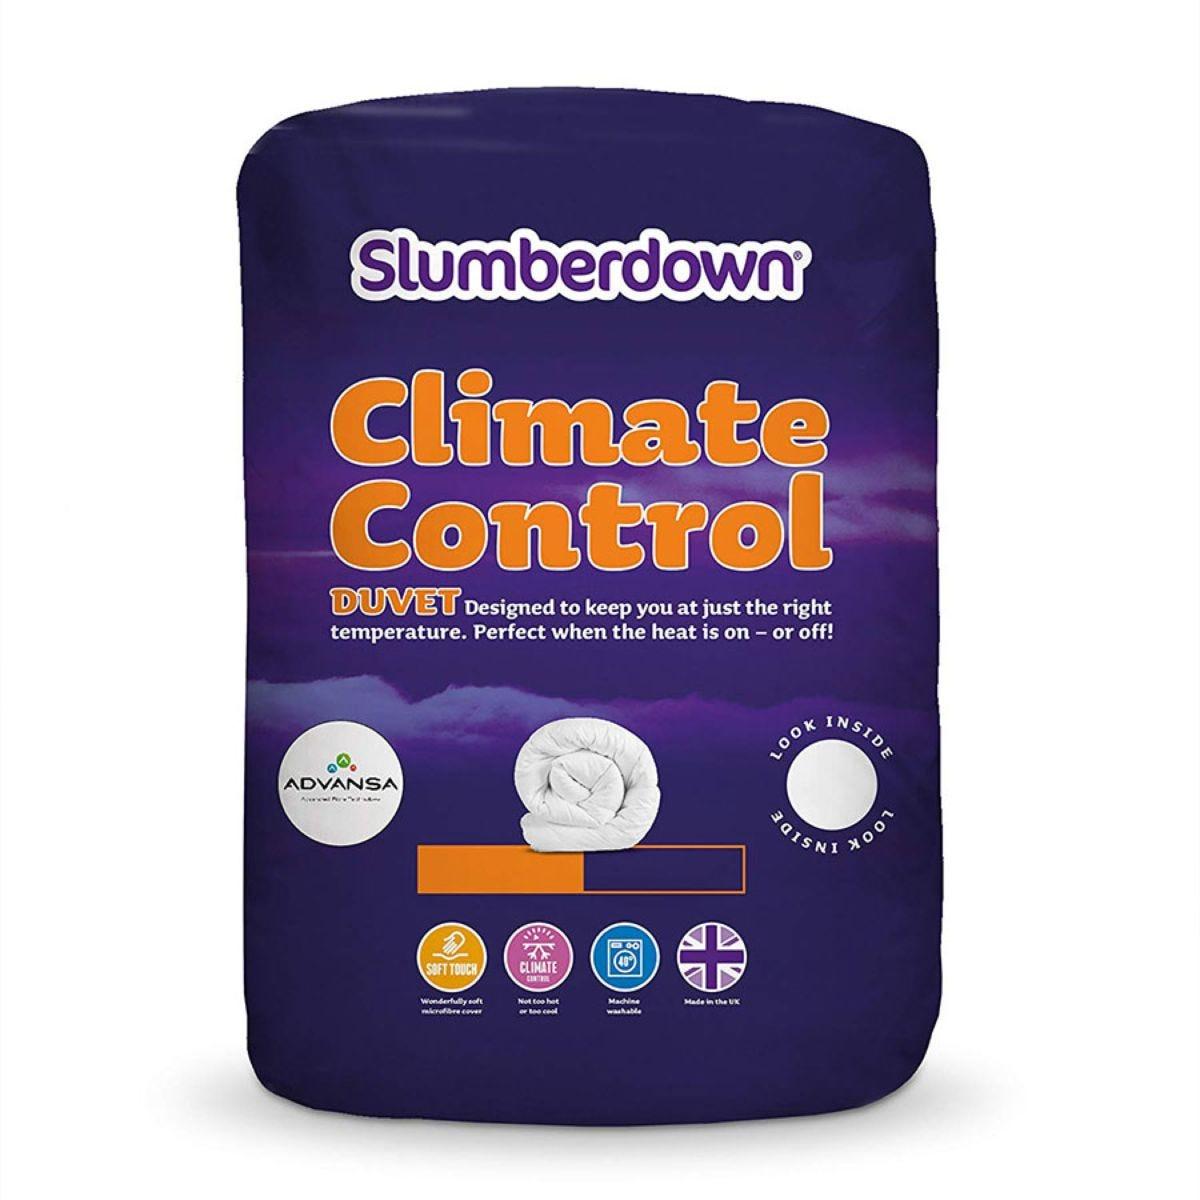 Slumberdown Climate Control Duvet 10.5 Tog